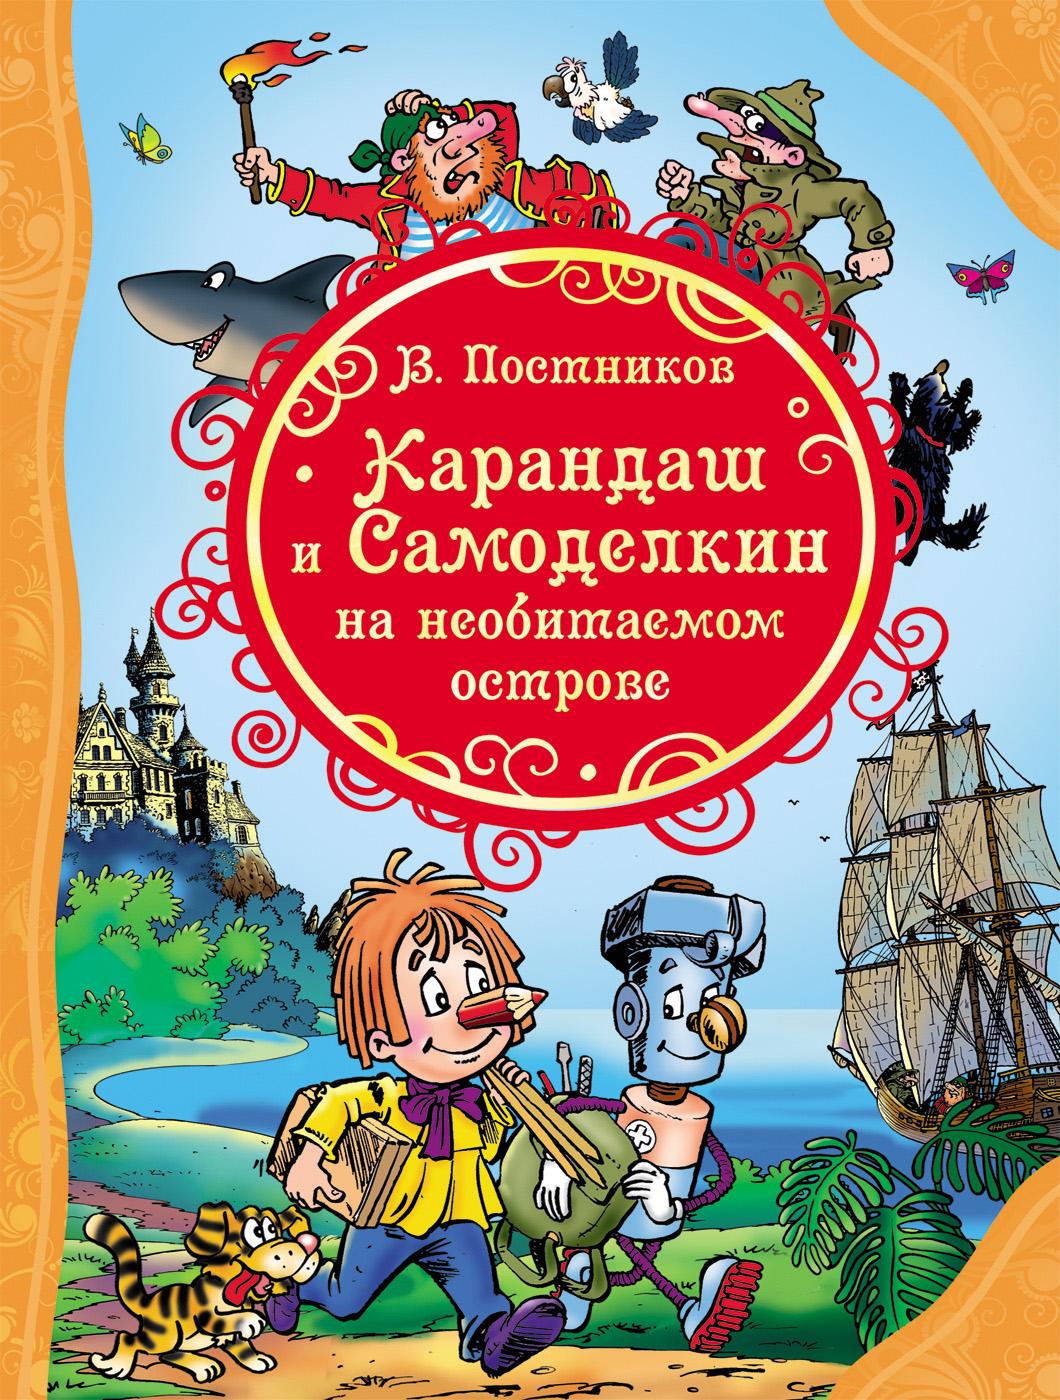 Постников В.Ф. Постников В. Карандаш и Самоделкин на необитаемом острове